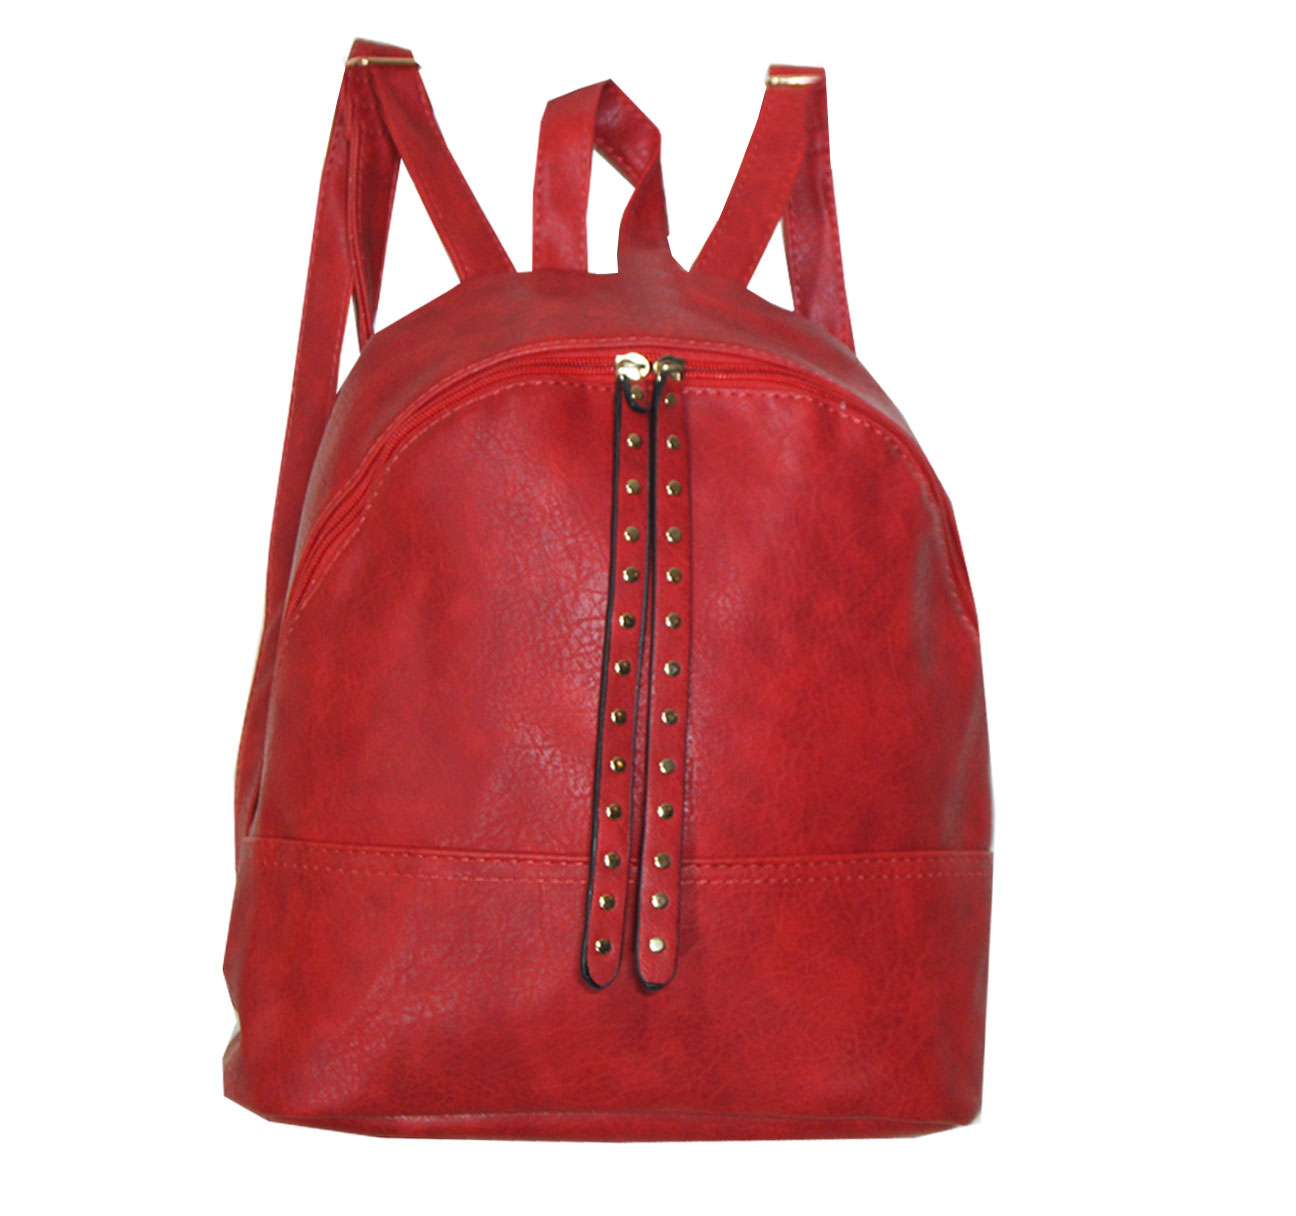 Backpack No 582 - Κόκκινο (Silvio 582)